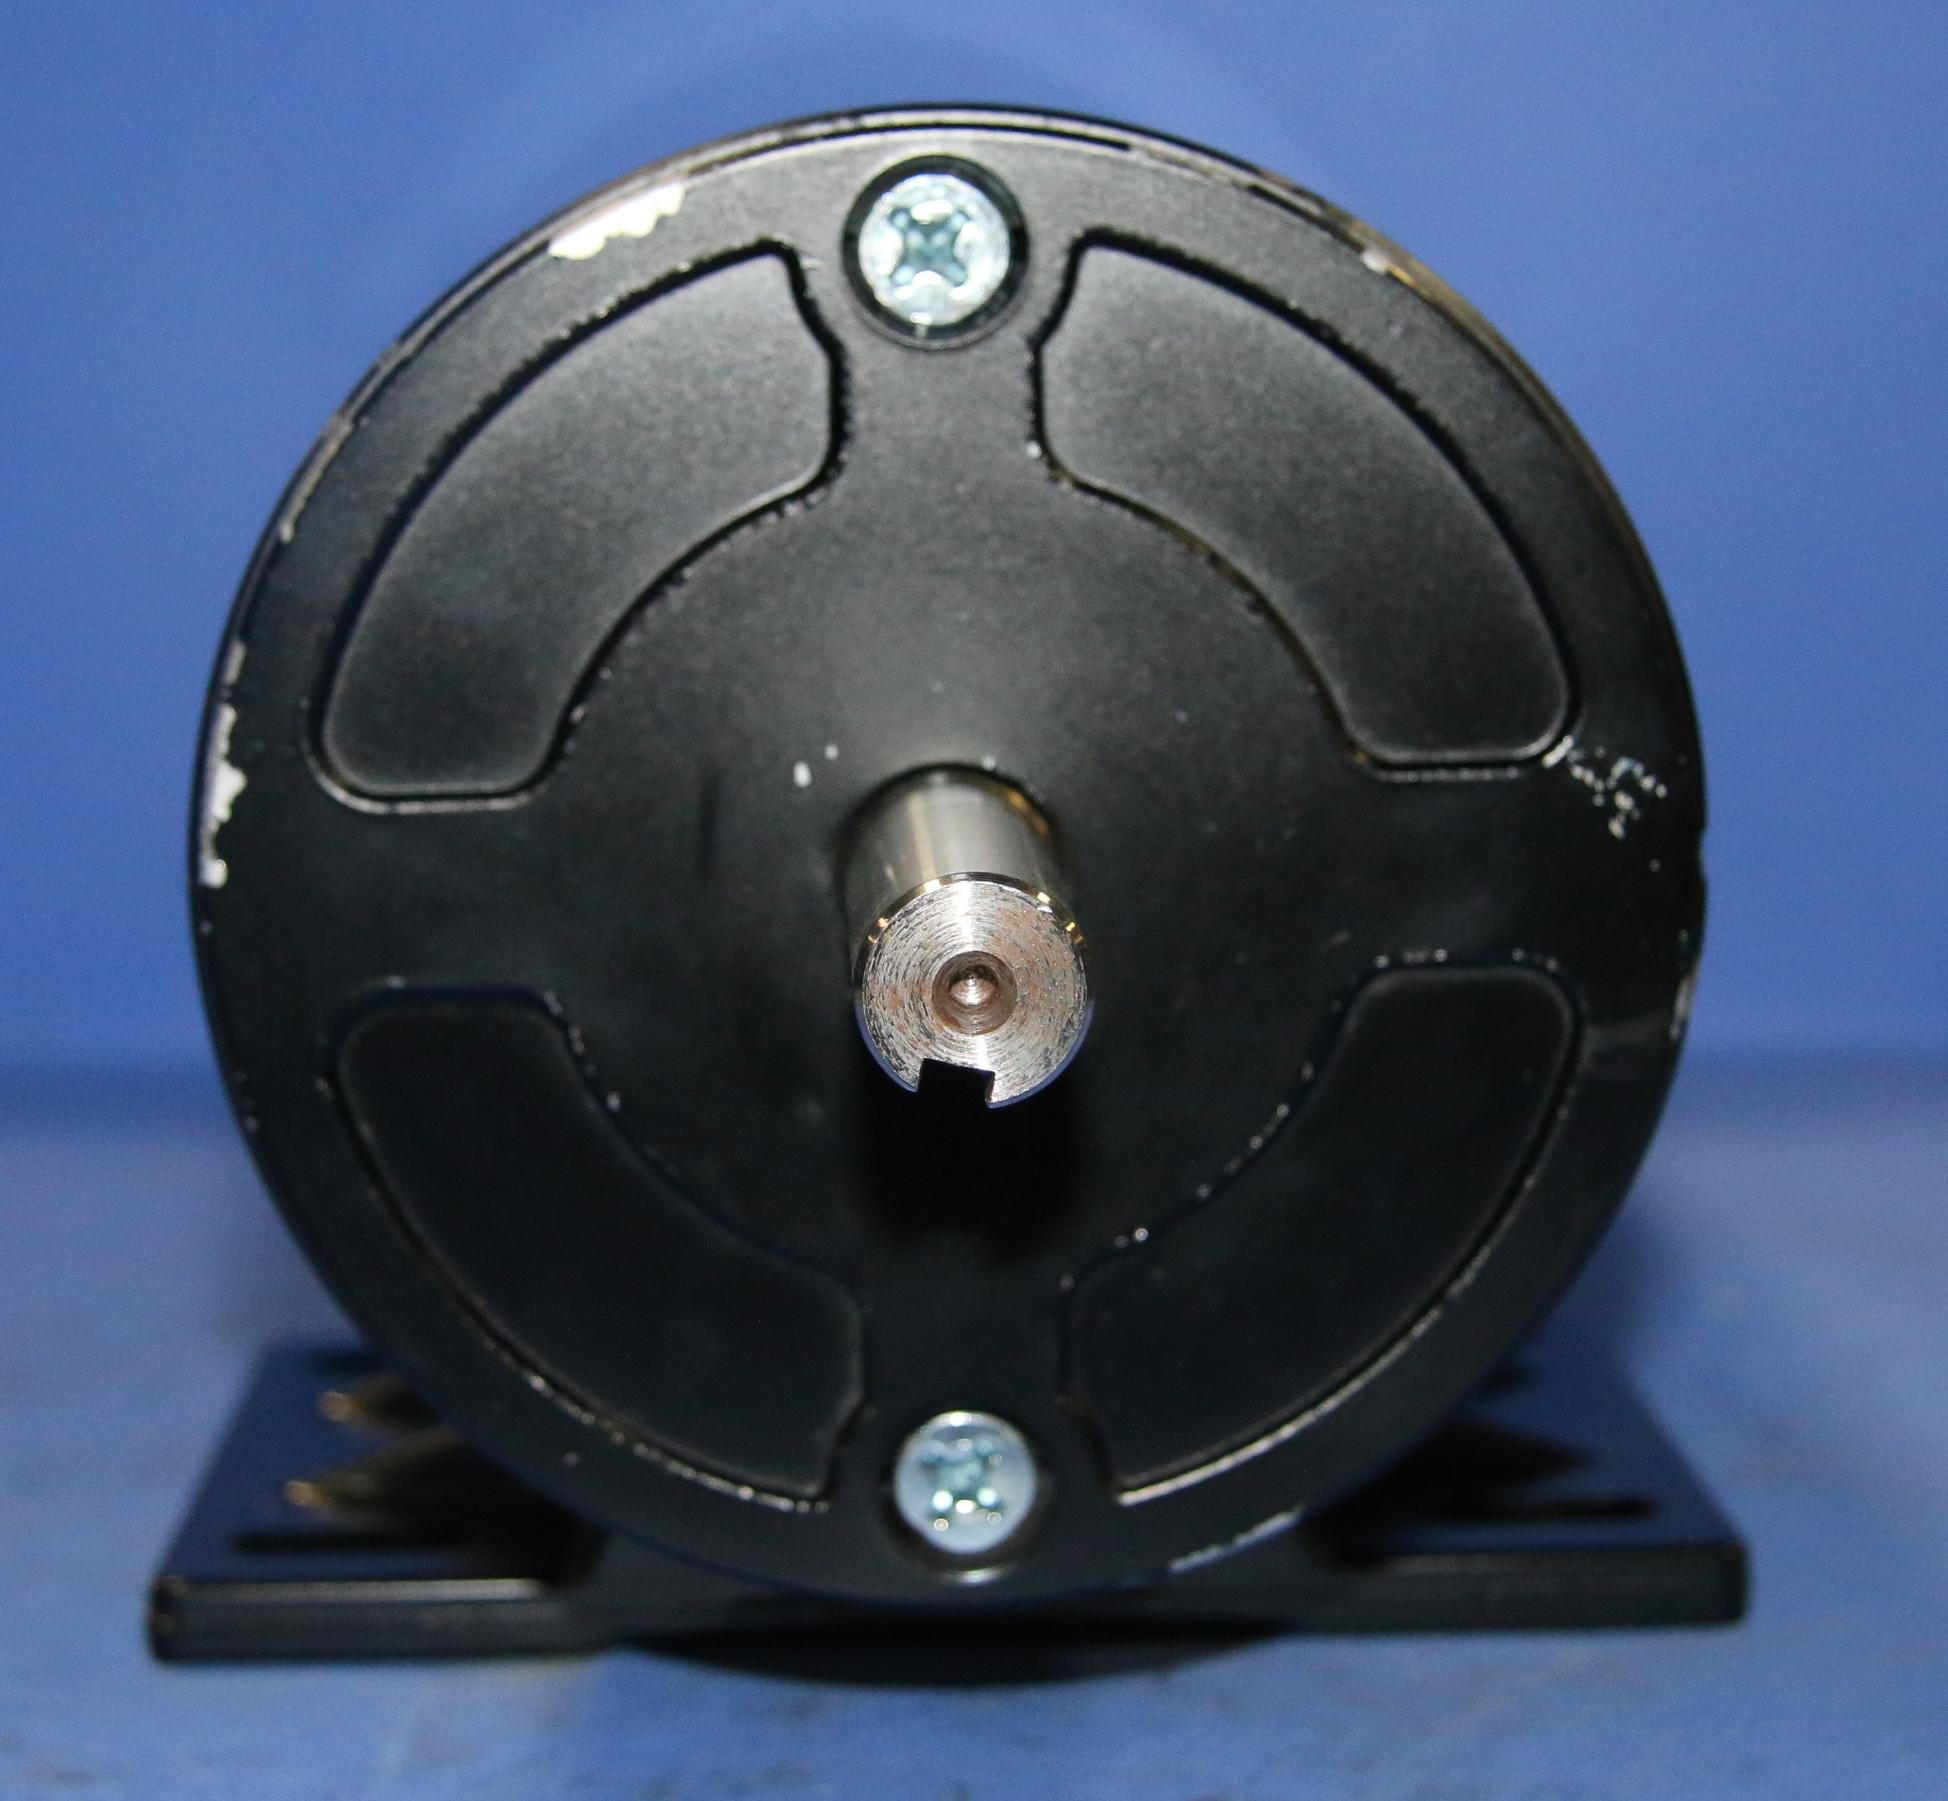 (1) Used Nilfisk Motor Scrub Deck Part Number: 0782-132 AKA Advance Machine Comp